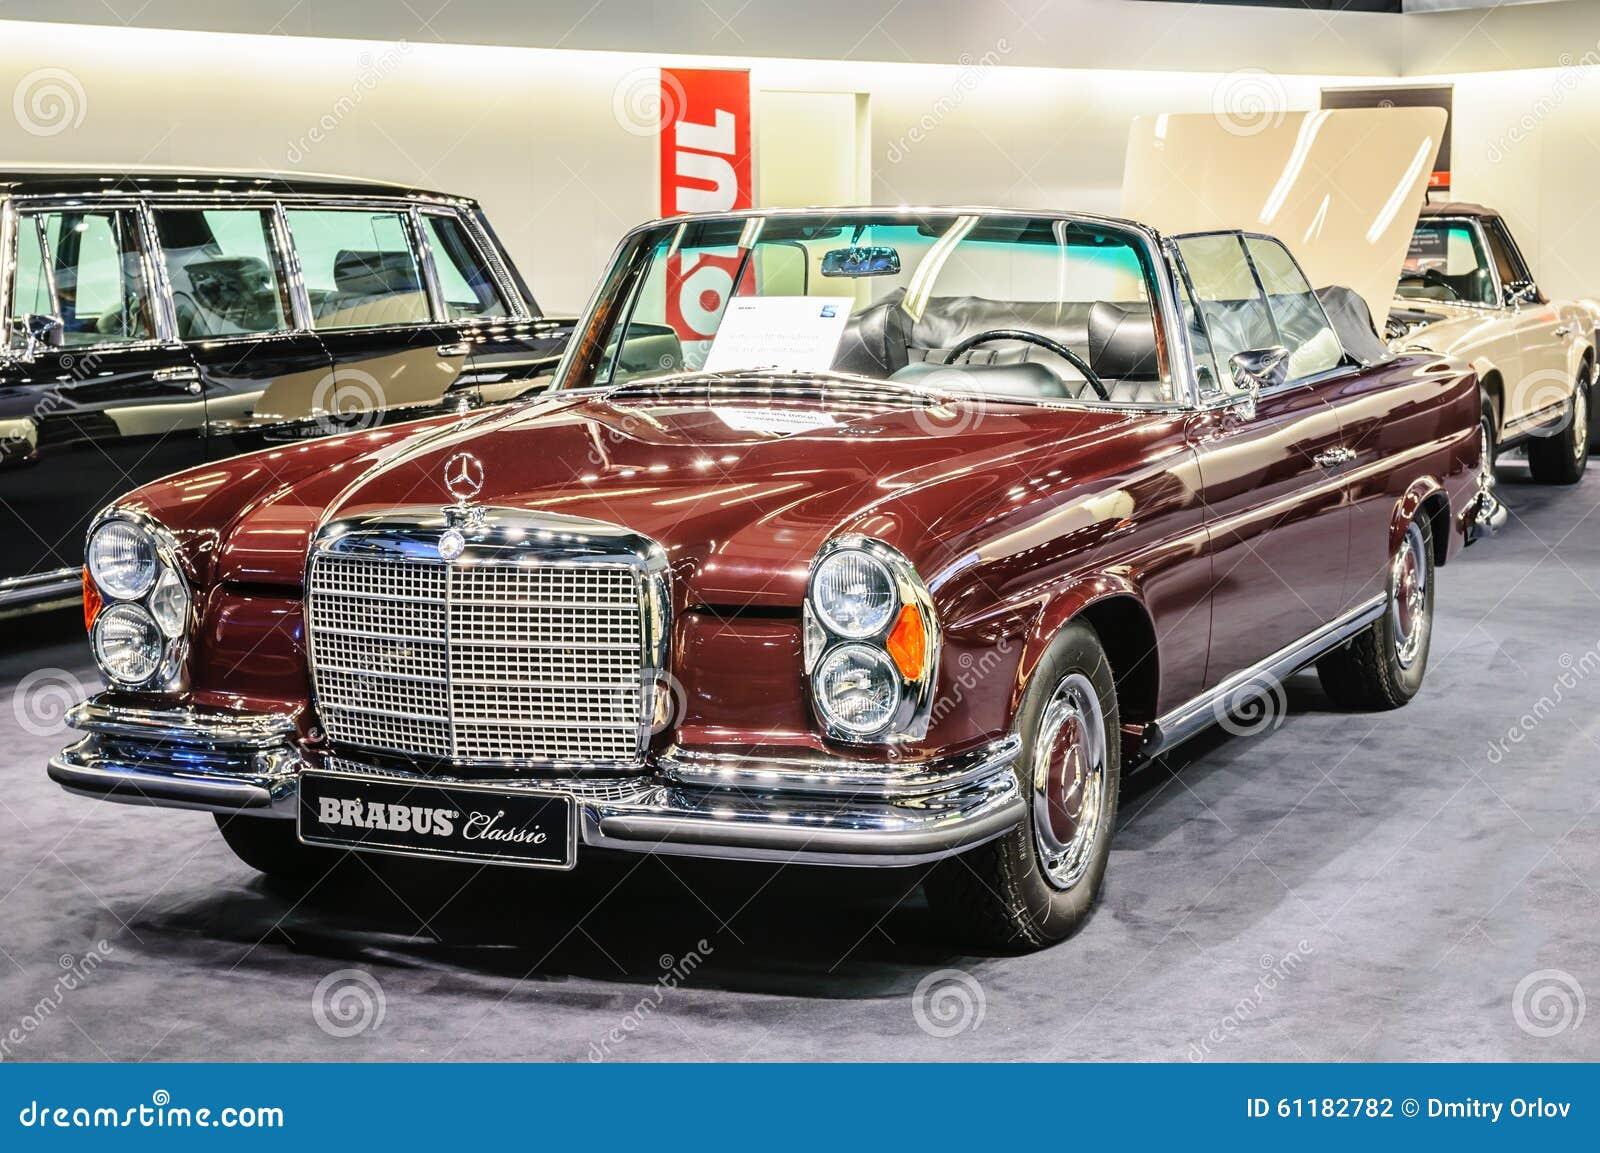 Mercedes benz 280sl car vehicl wrap mercedes benz merced pagoda - Frankfurt Sept 2015 Brabus Classic Mercedes Benz 280 Se 3 5 C Stock Photography